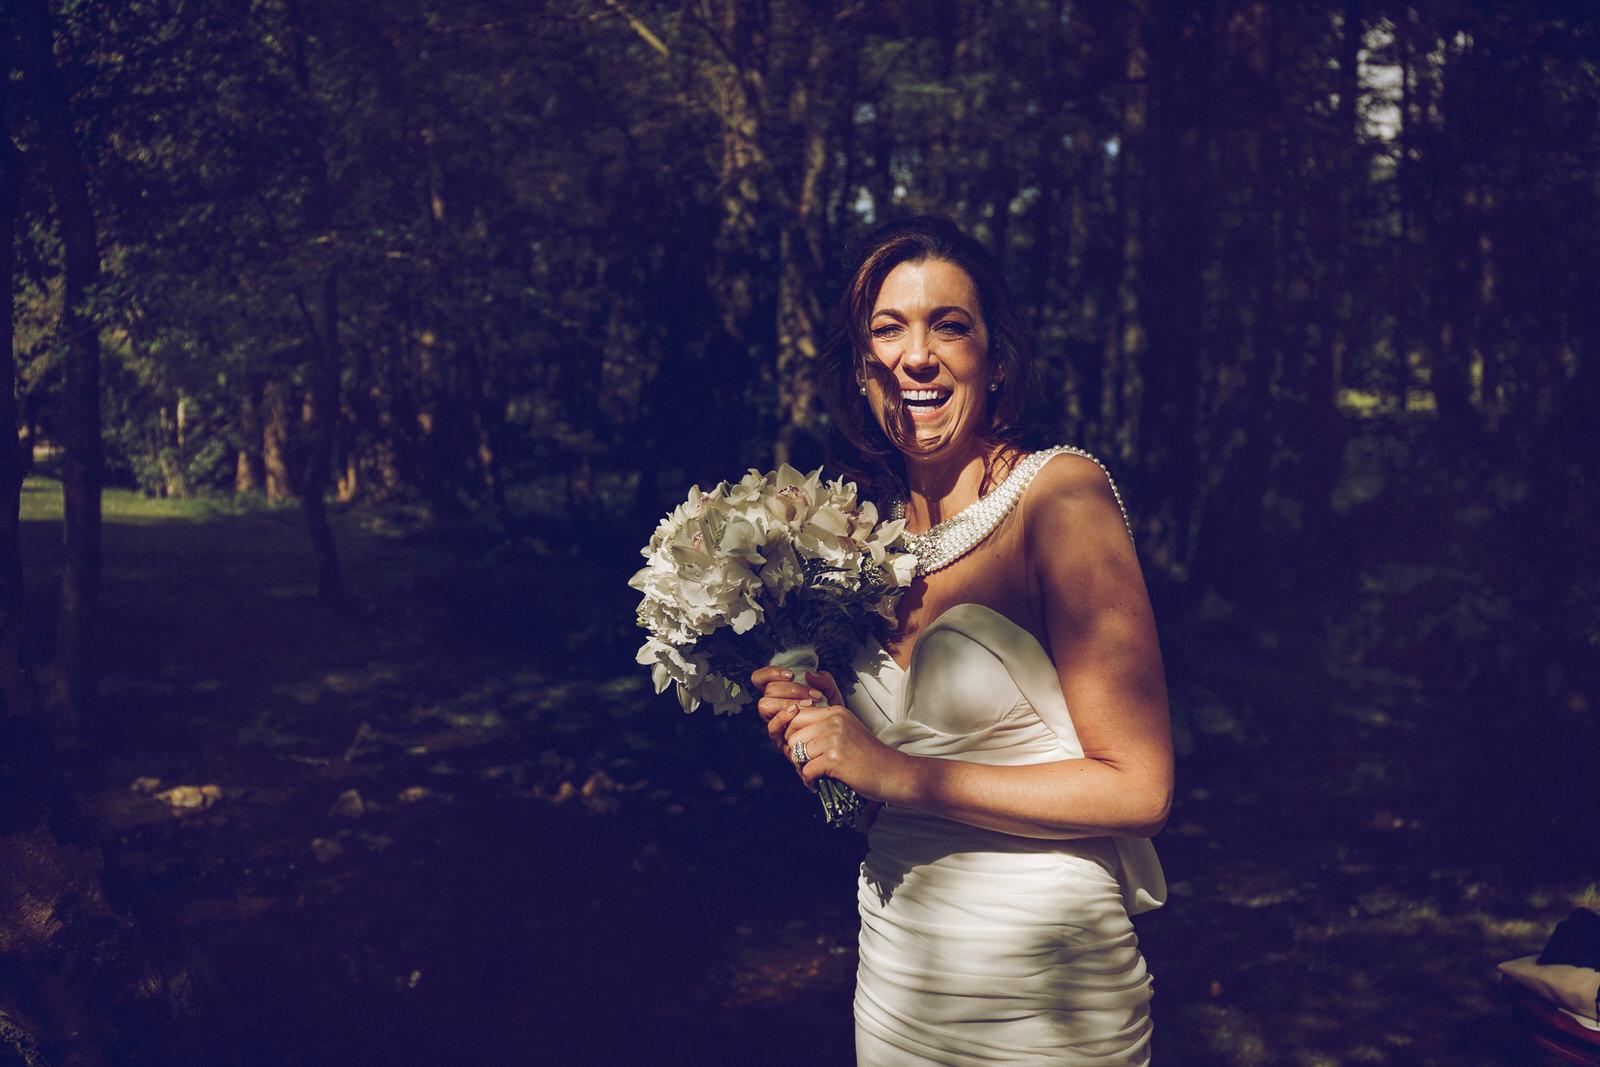 Brooklodge-wicklow-wedding-photographer_099.jpg